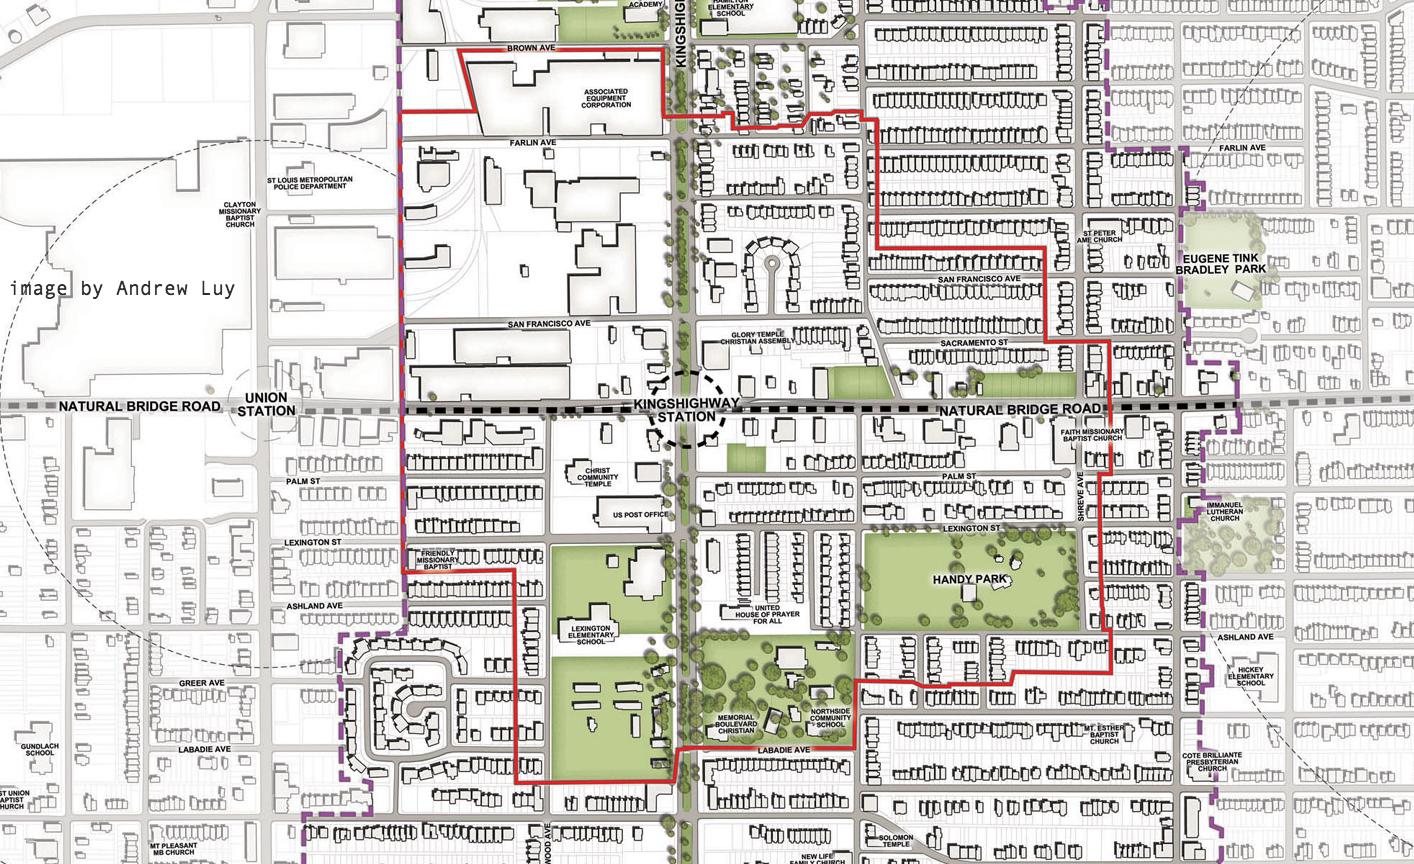 NorthsideSouthside MetroLink Expansion and Transforming Transit in